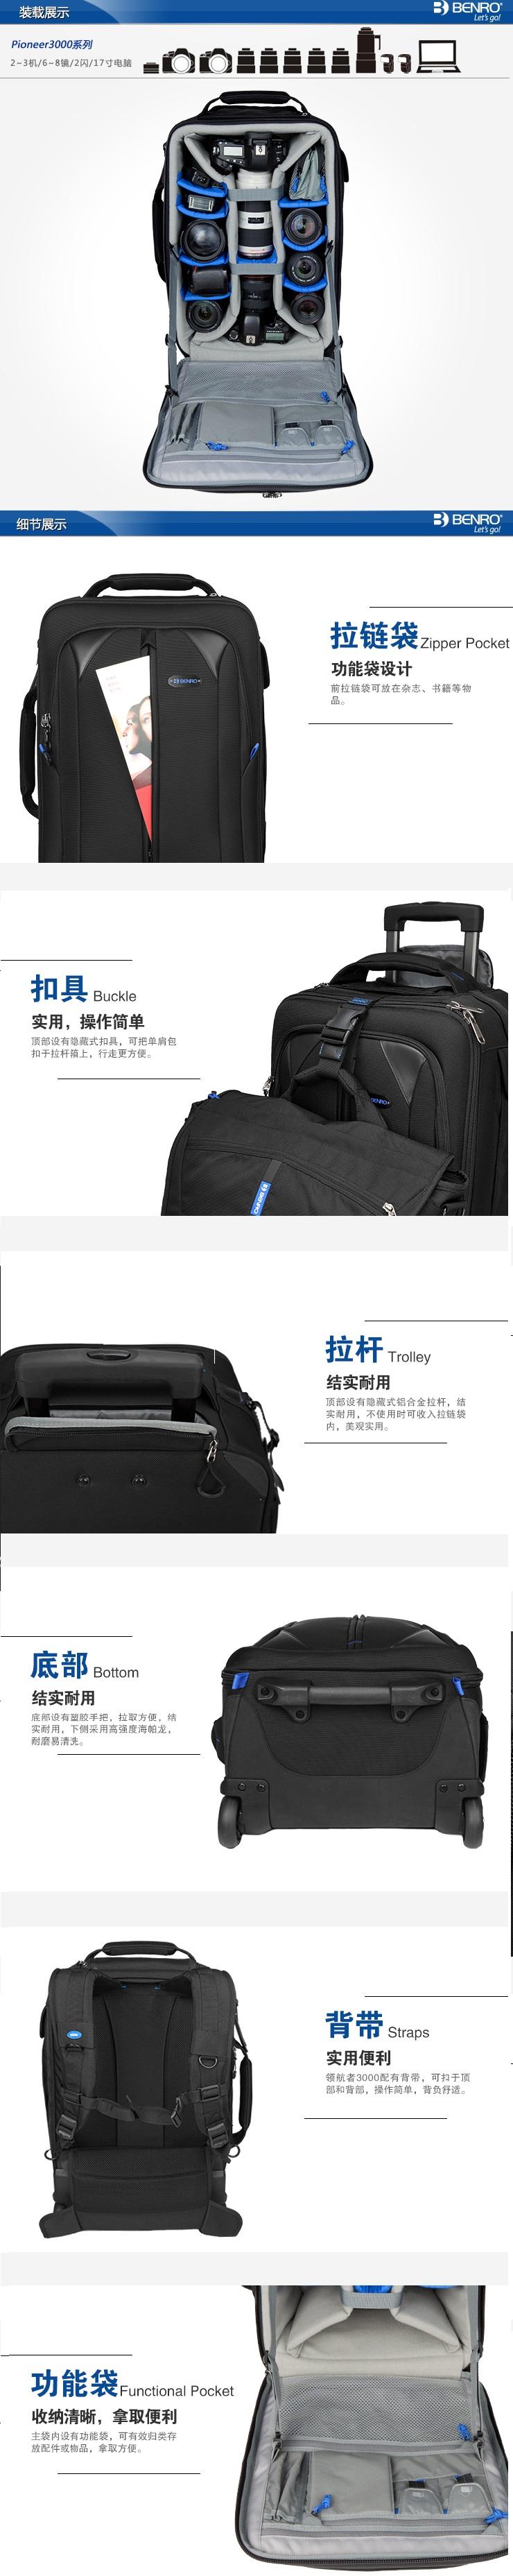 benro-luggage-pioneer-3000-d-yingkee3.jpg